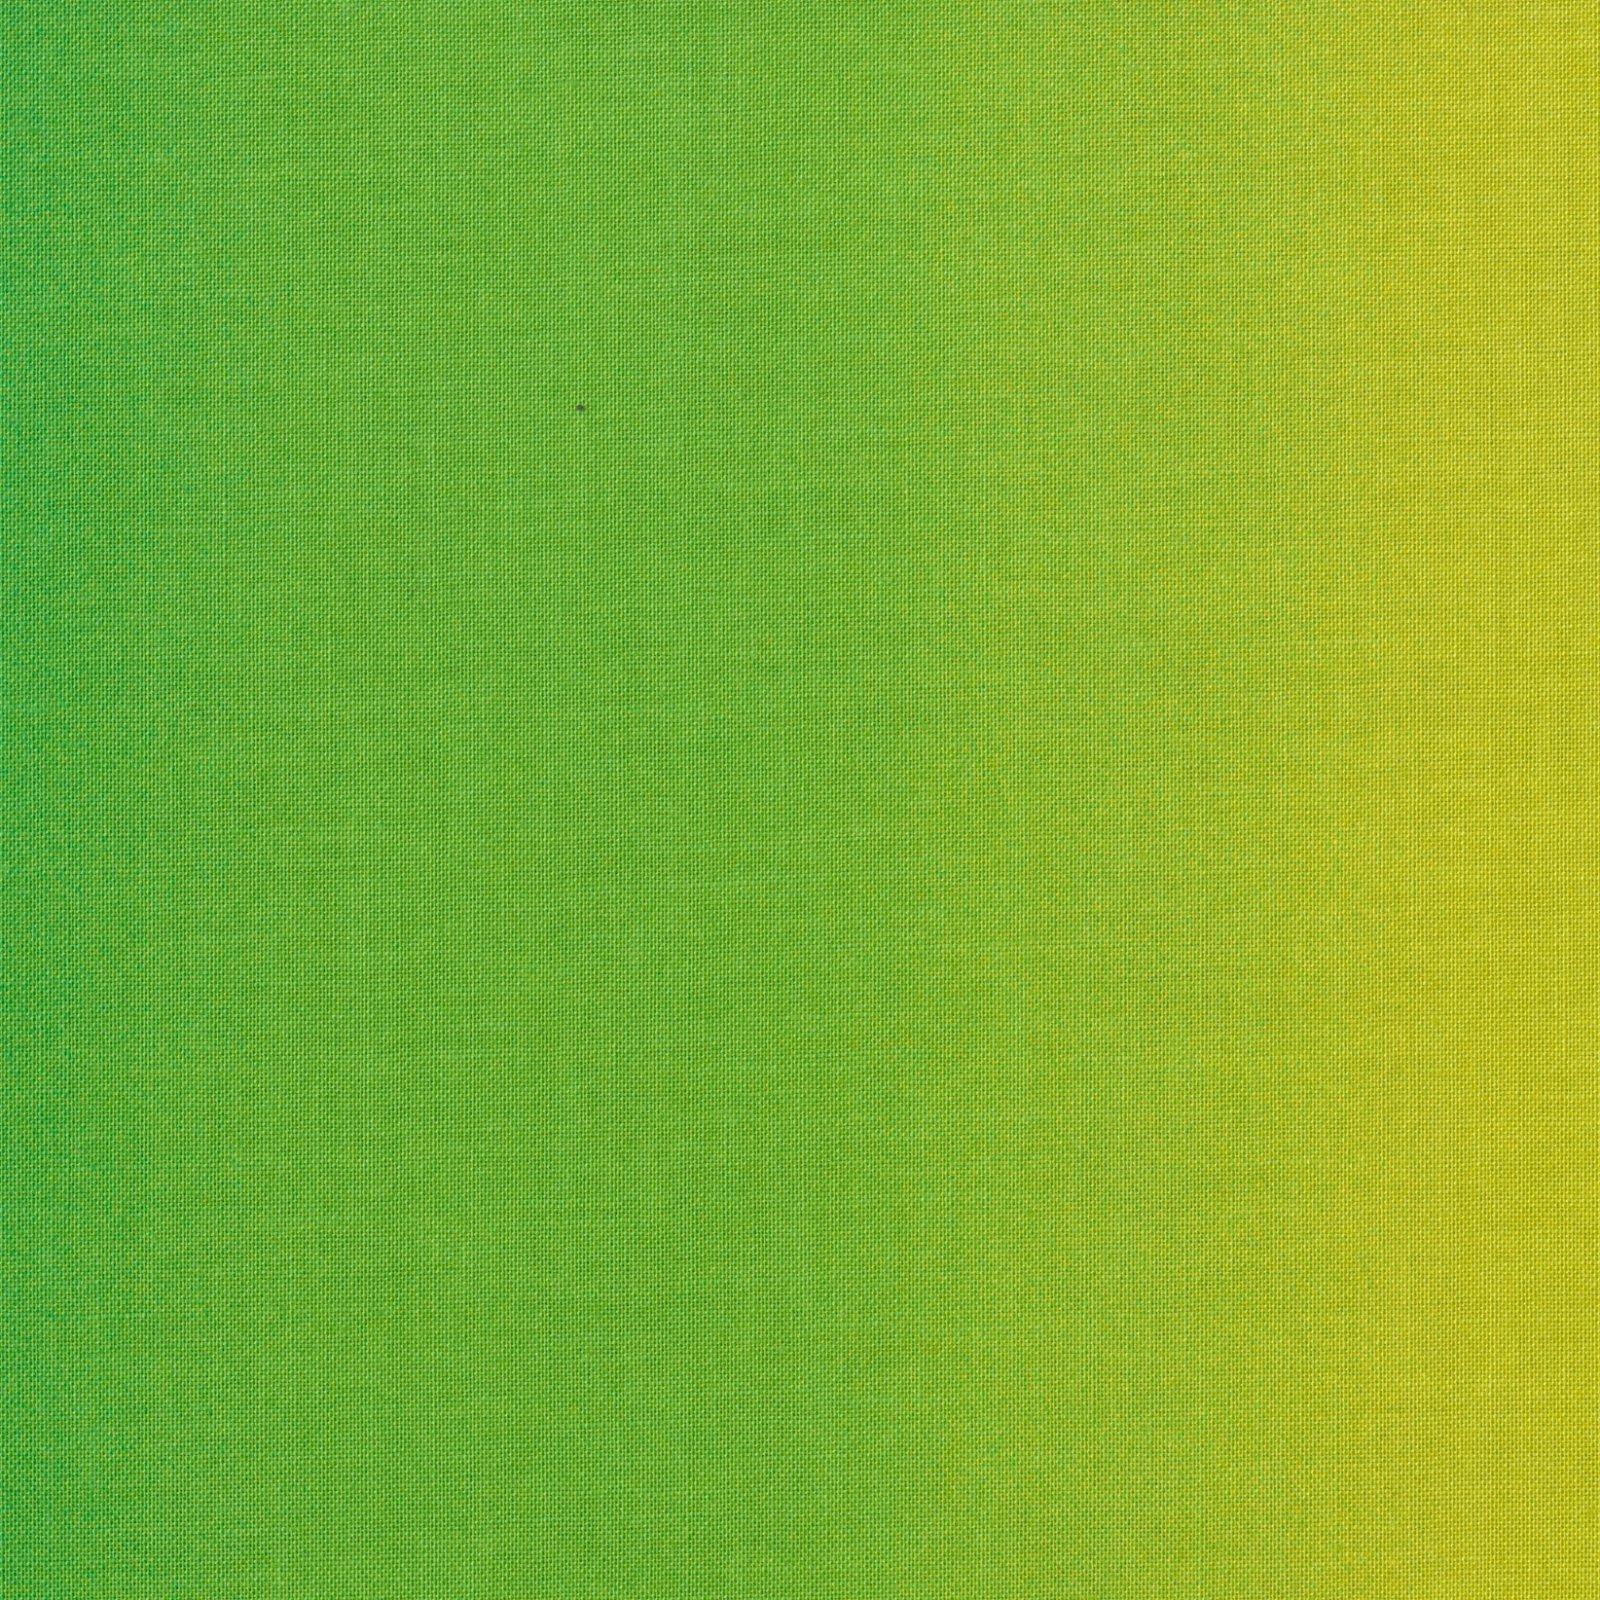 CLOT-K2666 23 - SHADES BY KINKAME LIGHT OLIVE